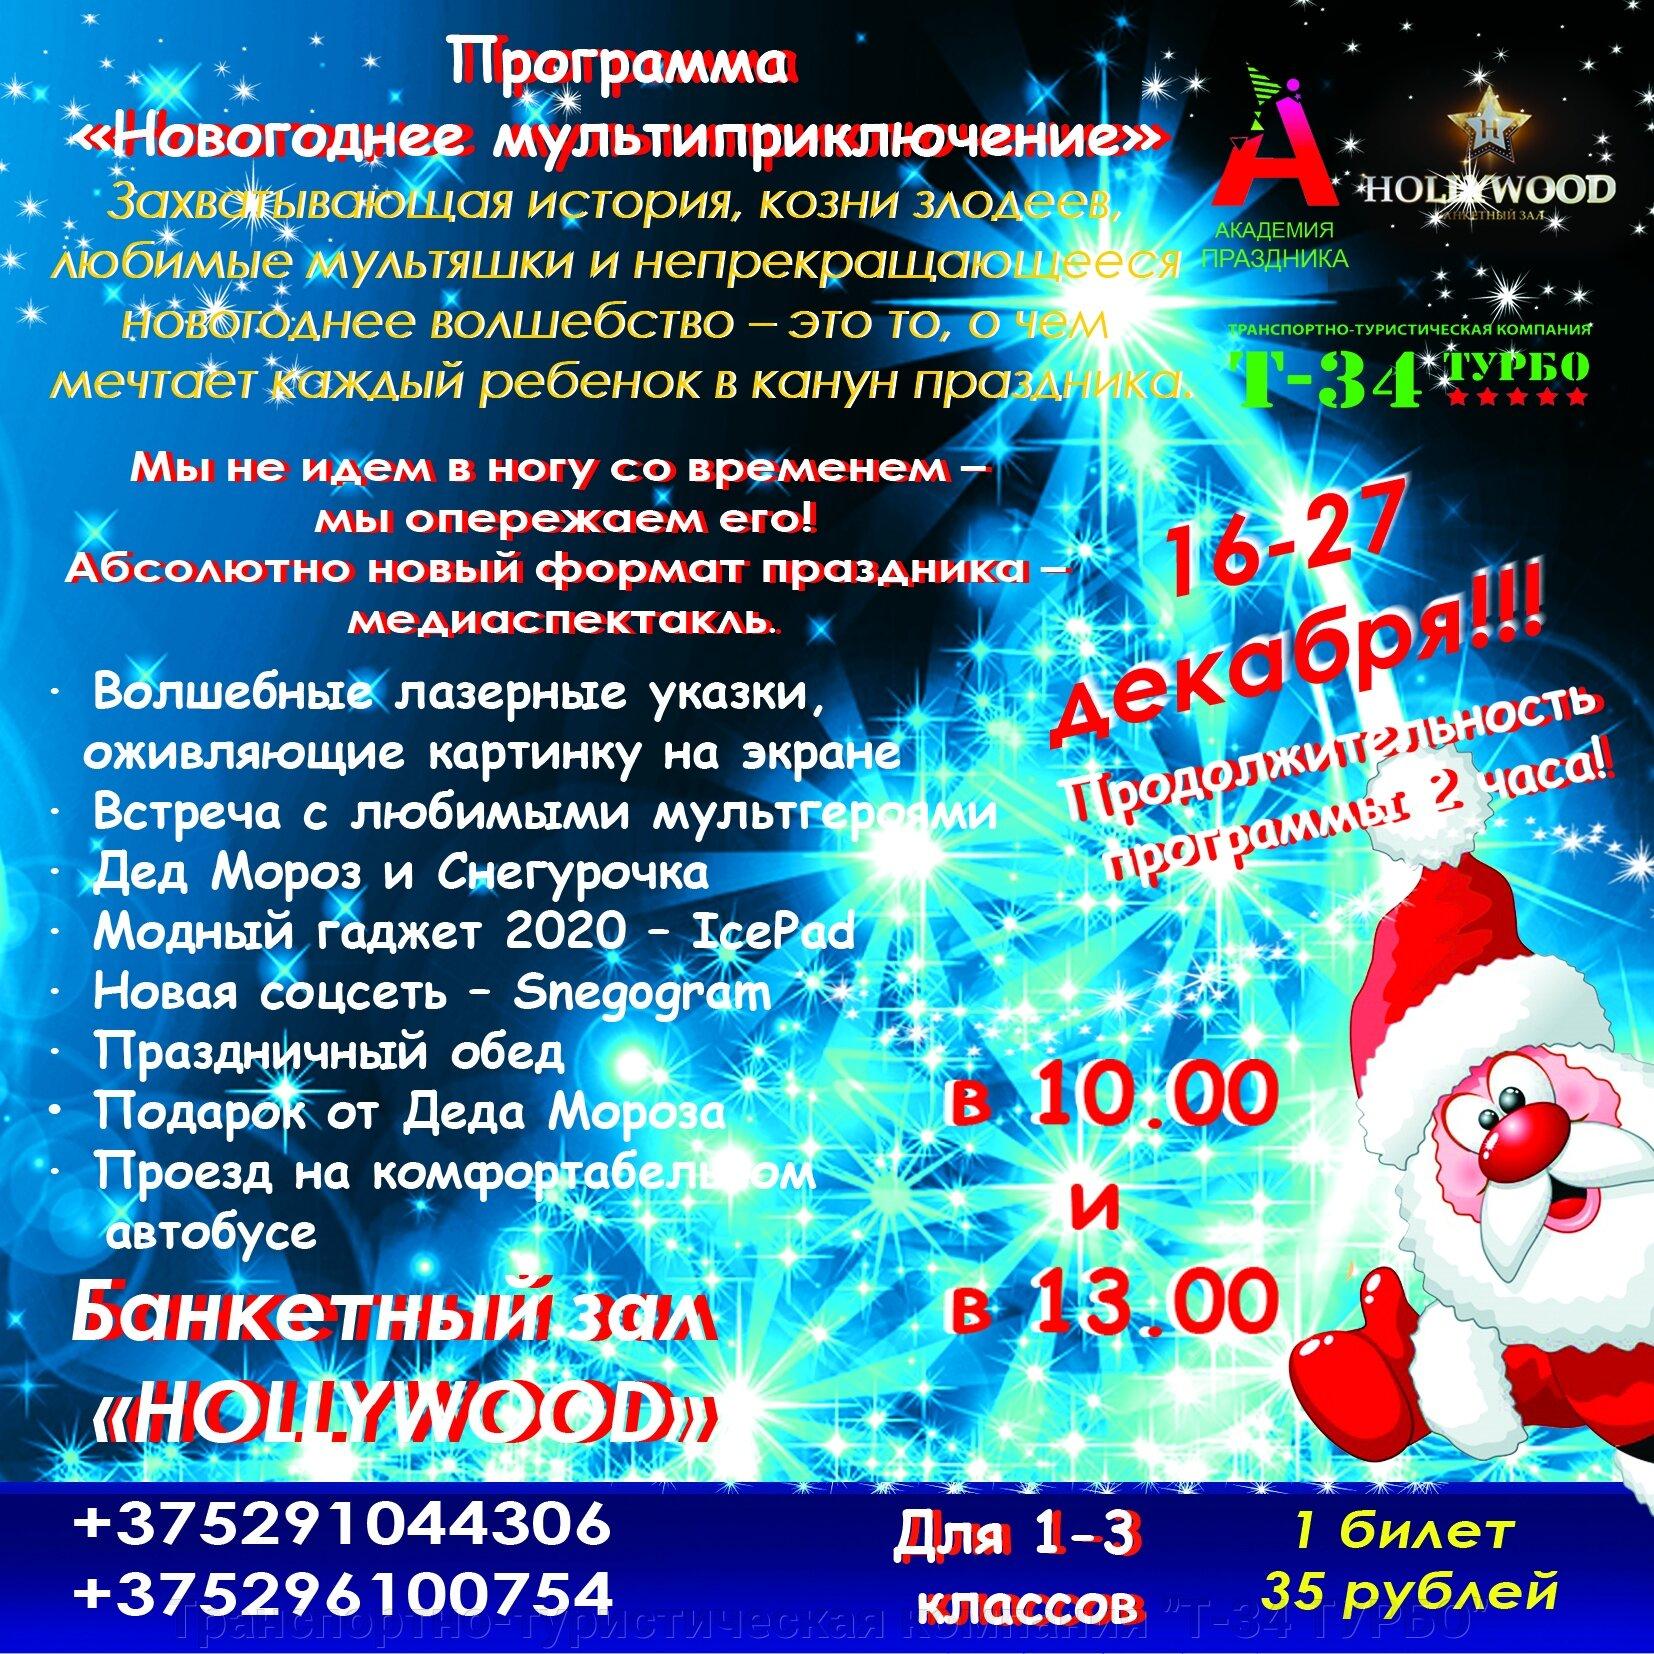 Новогоднее мультиприключение для 1-3 классов - фото pic_193ef2b7a8ab7d33506ad136fbe29409_1920x9000_1.jpg